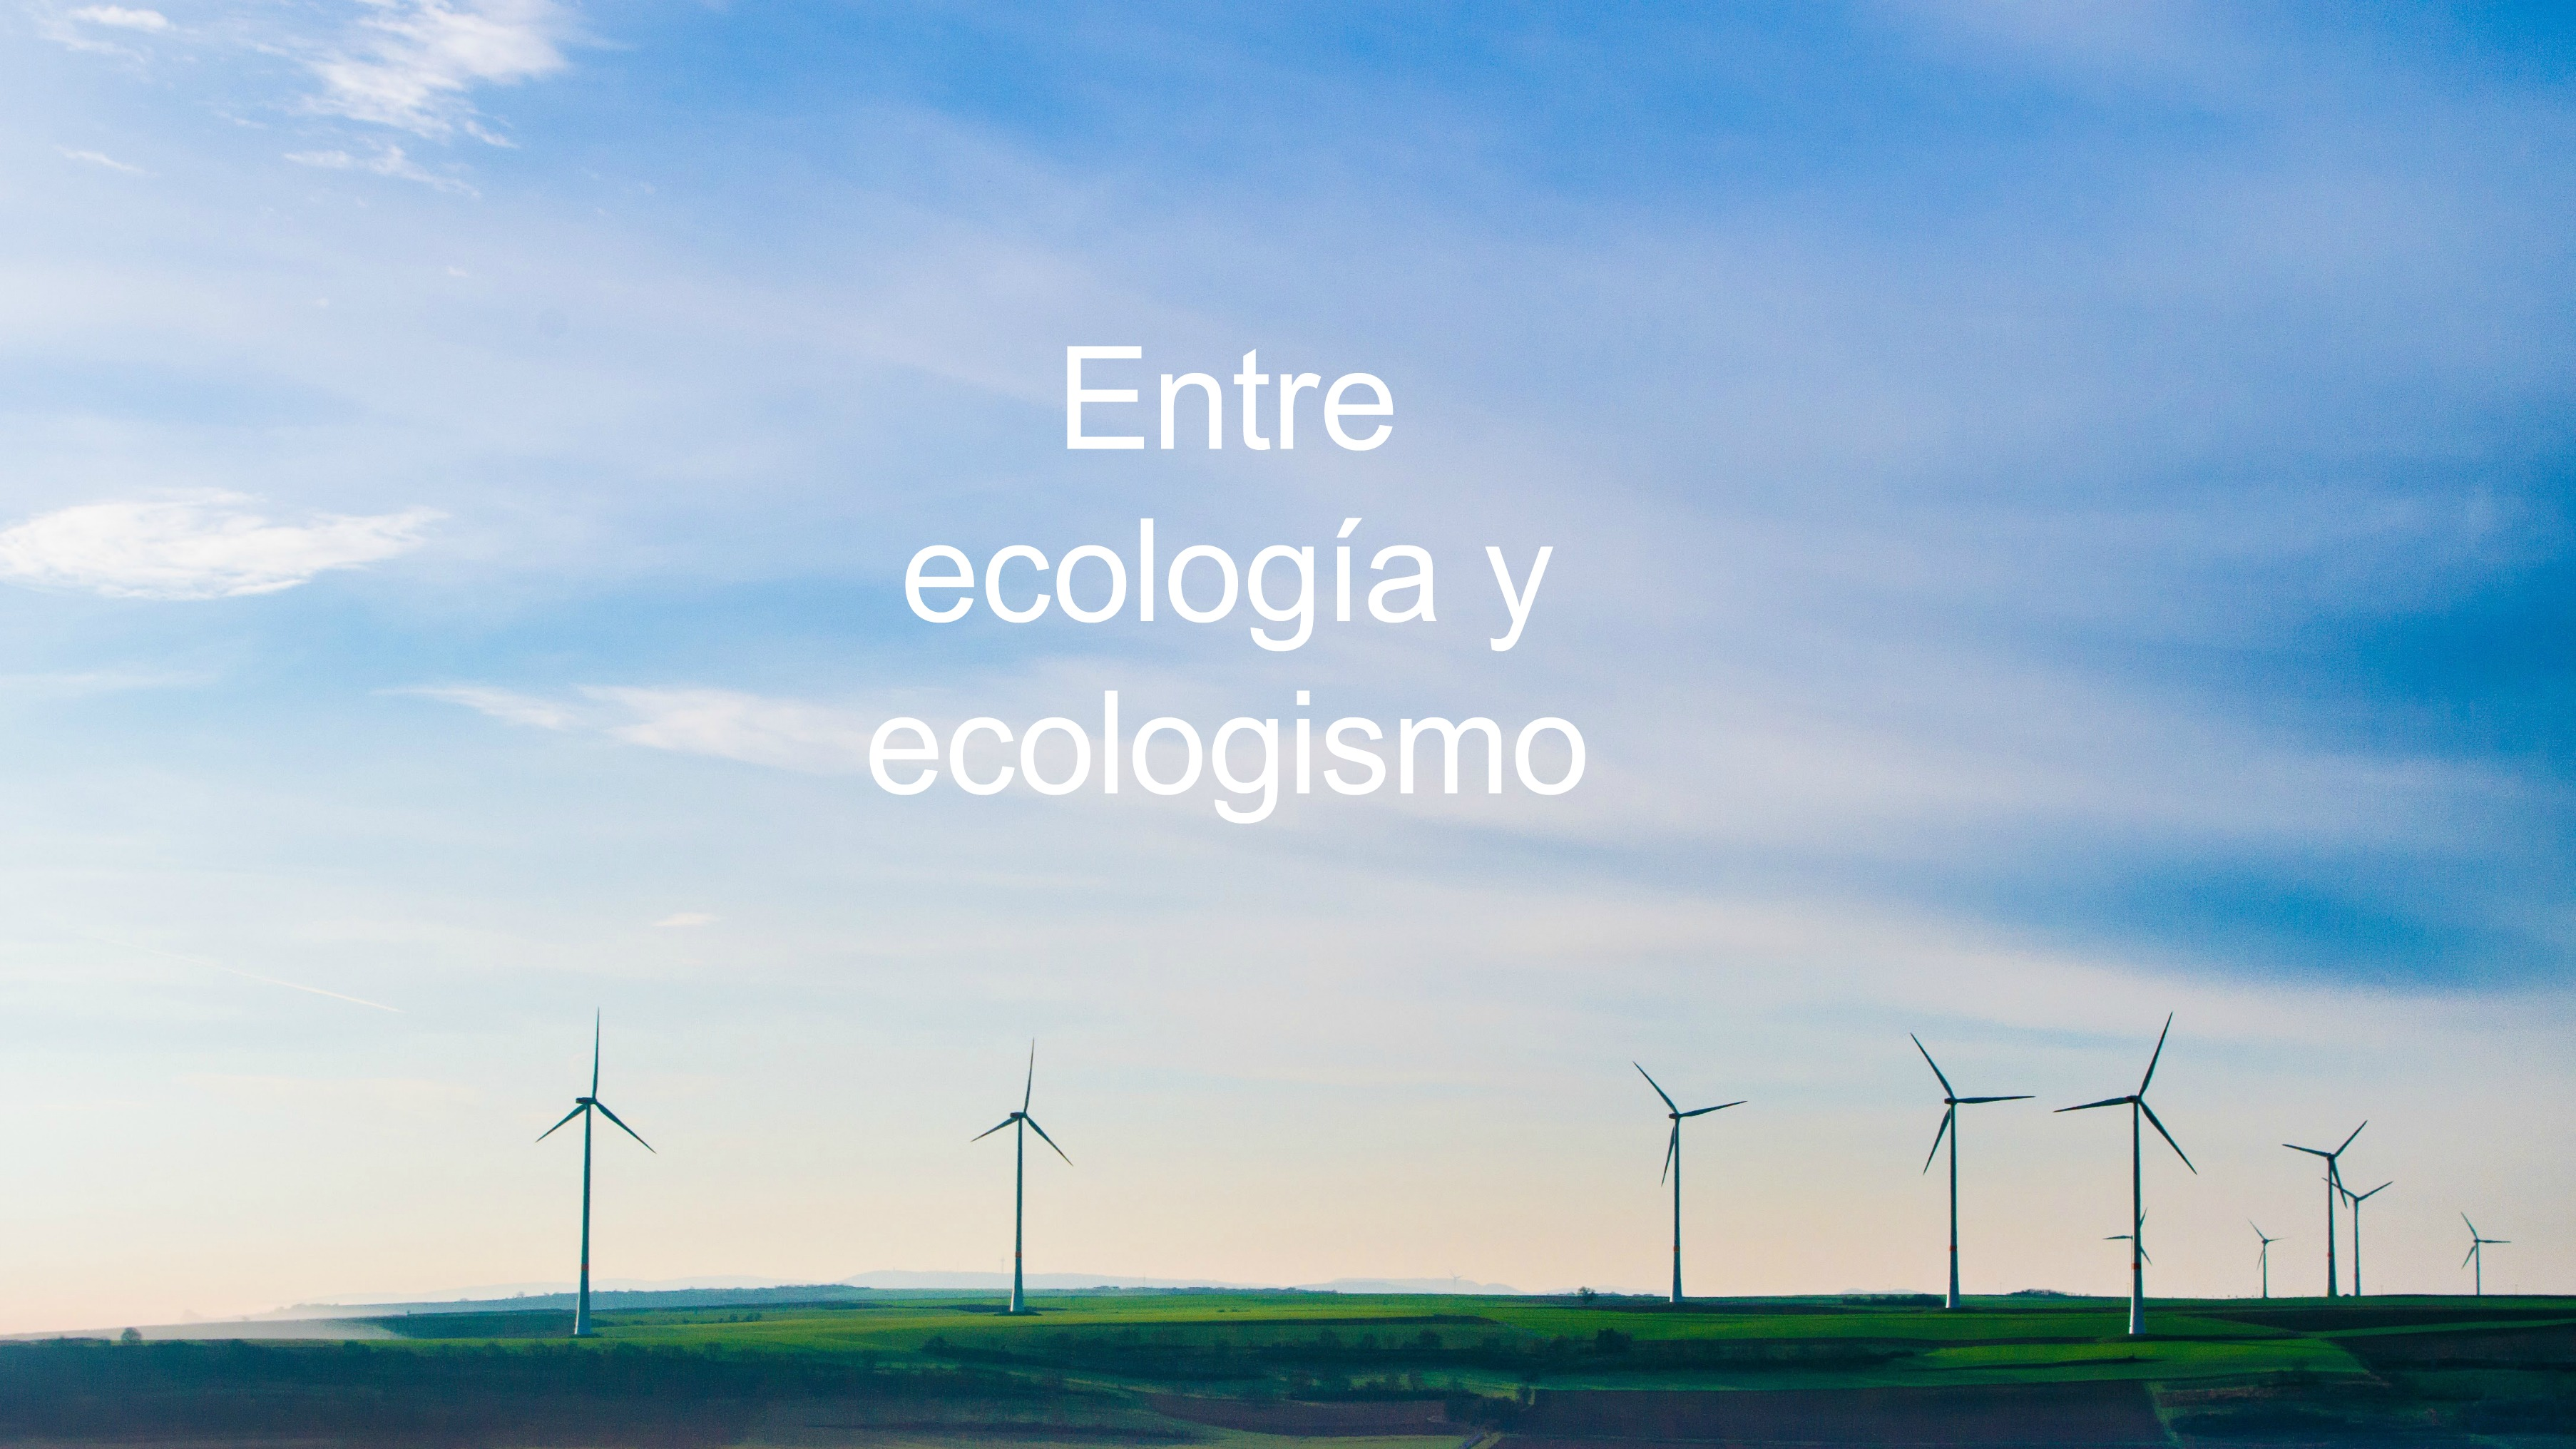 ecologia y ecologismo